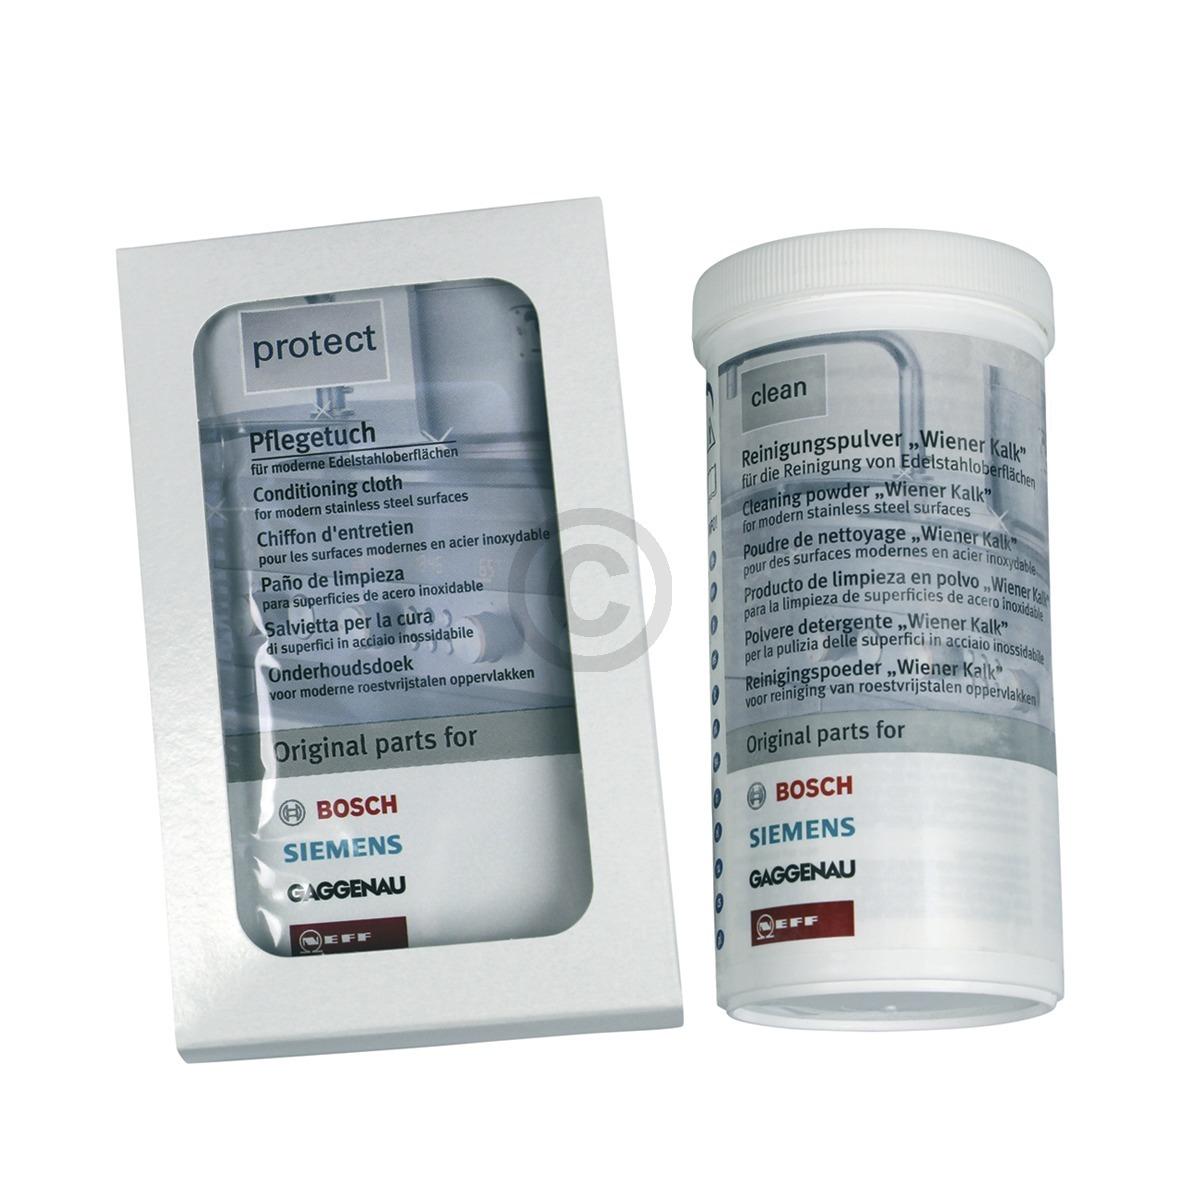 EdelstahlPflegeSet Bosch 00311775 BSH clean+protect Bosch, Siemens, Neff